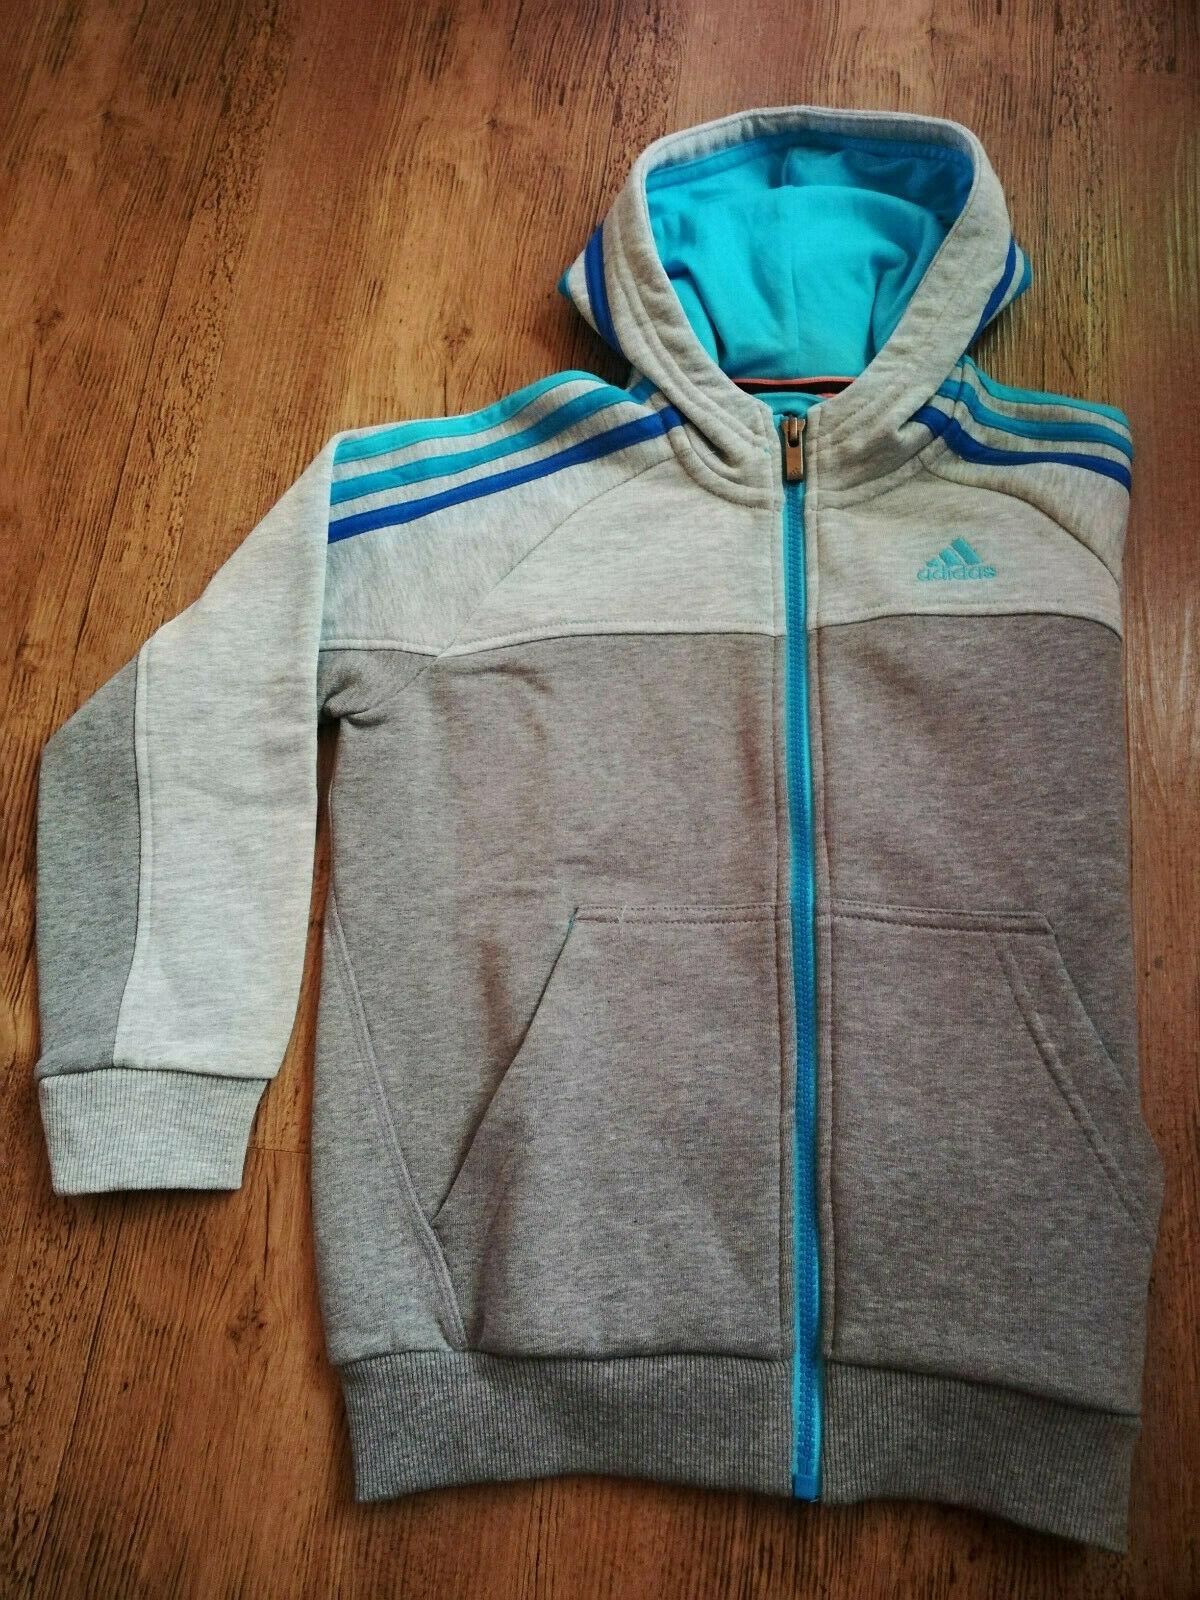 Adidas Sweatjacke Jacke Sport Jungen Mädchen grau blau Trainingsjacke NEU